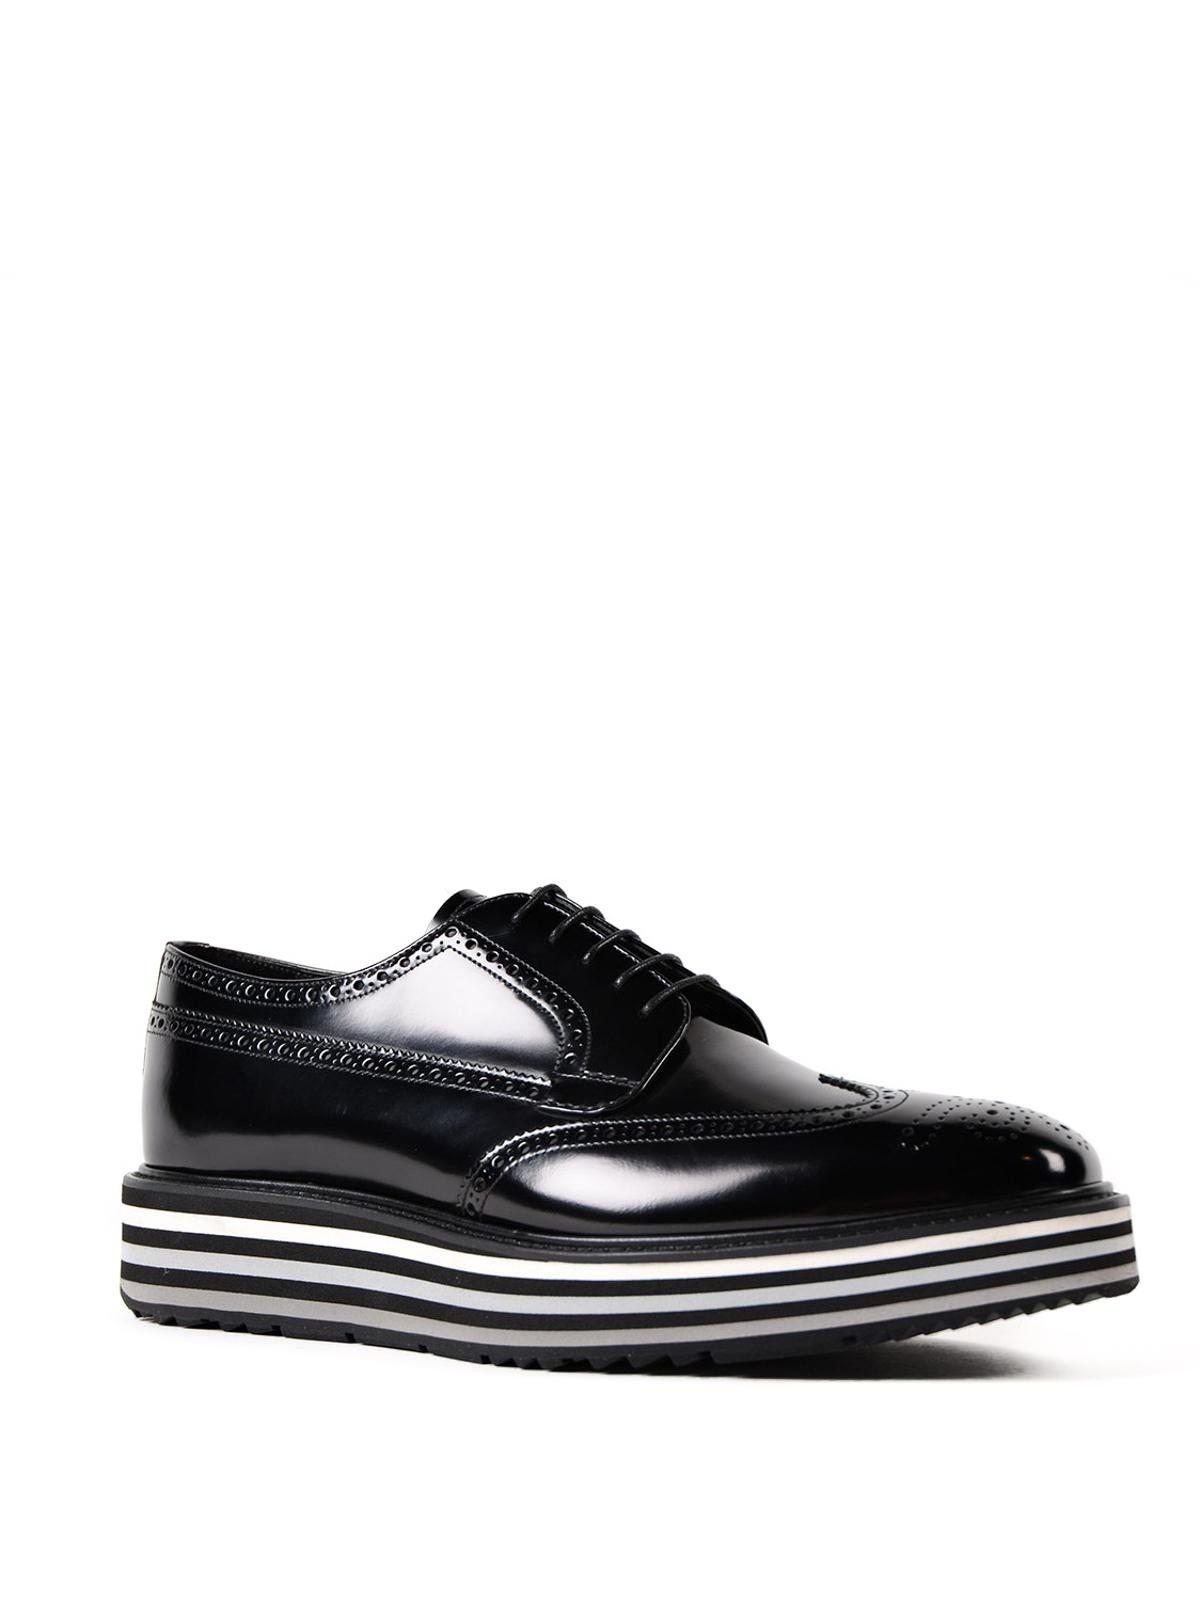 a9486a248800 PRADA  lace-ups shoes online - Platform Derby brogue brushed shoes